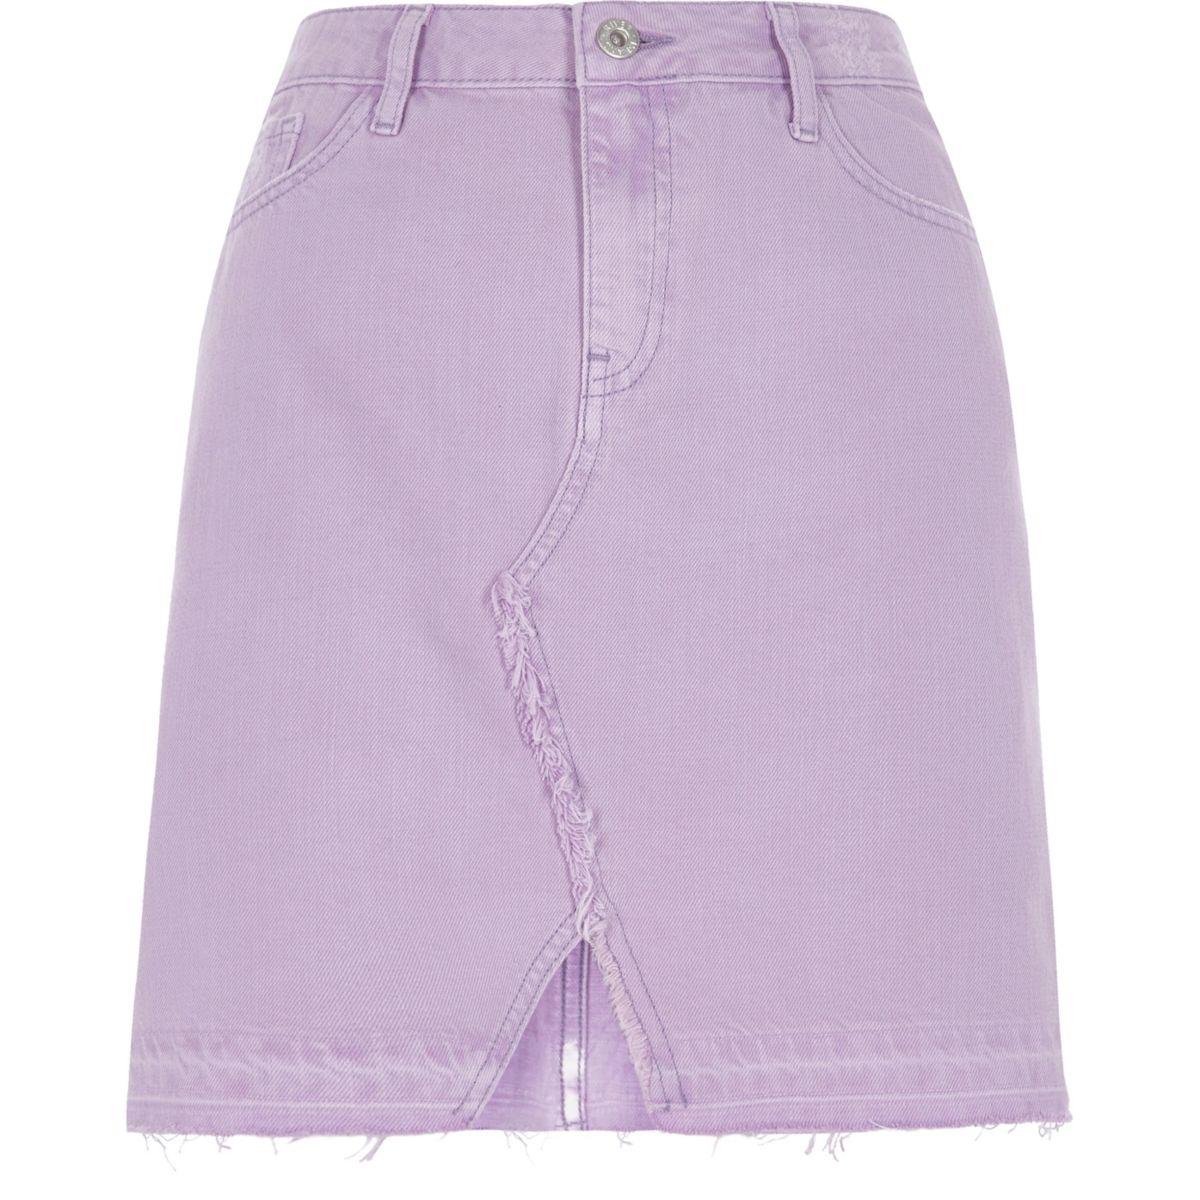 Light purple released hem denim mini skirt